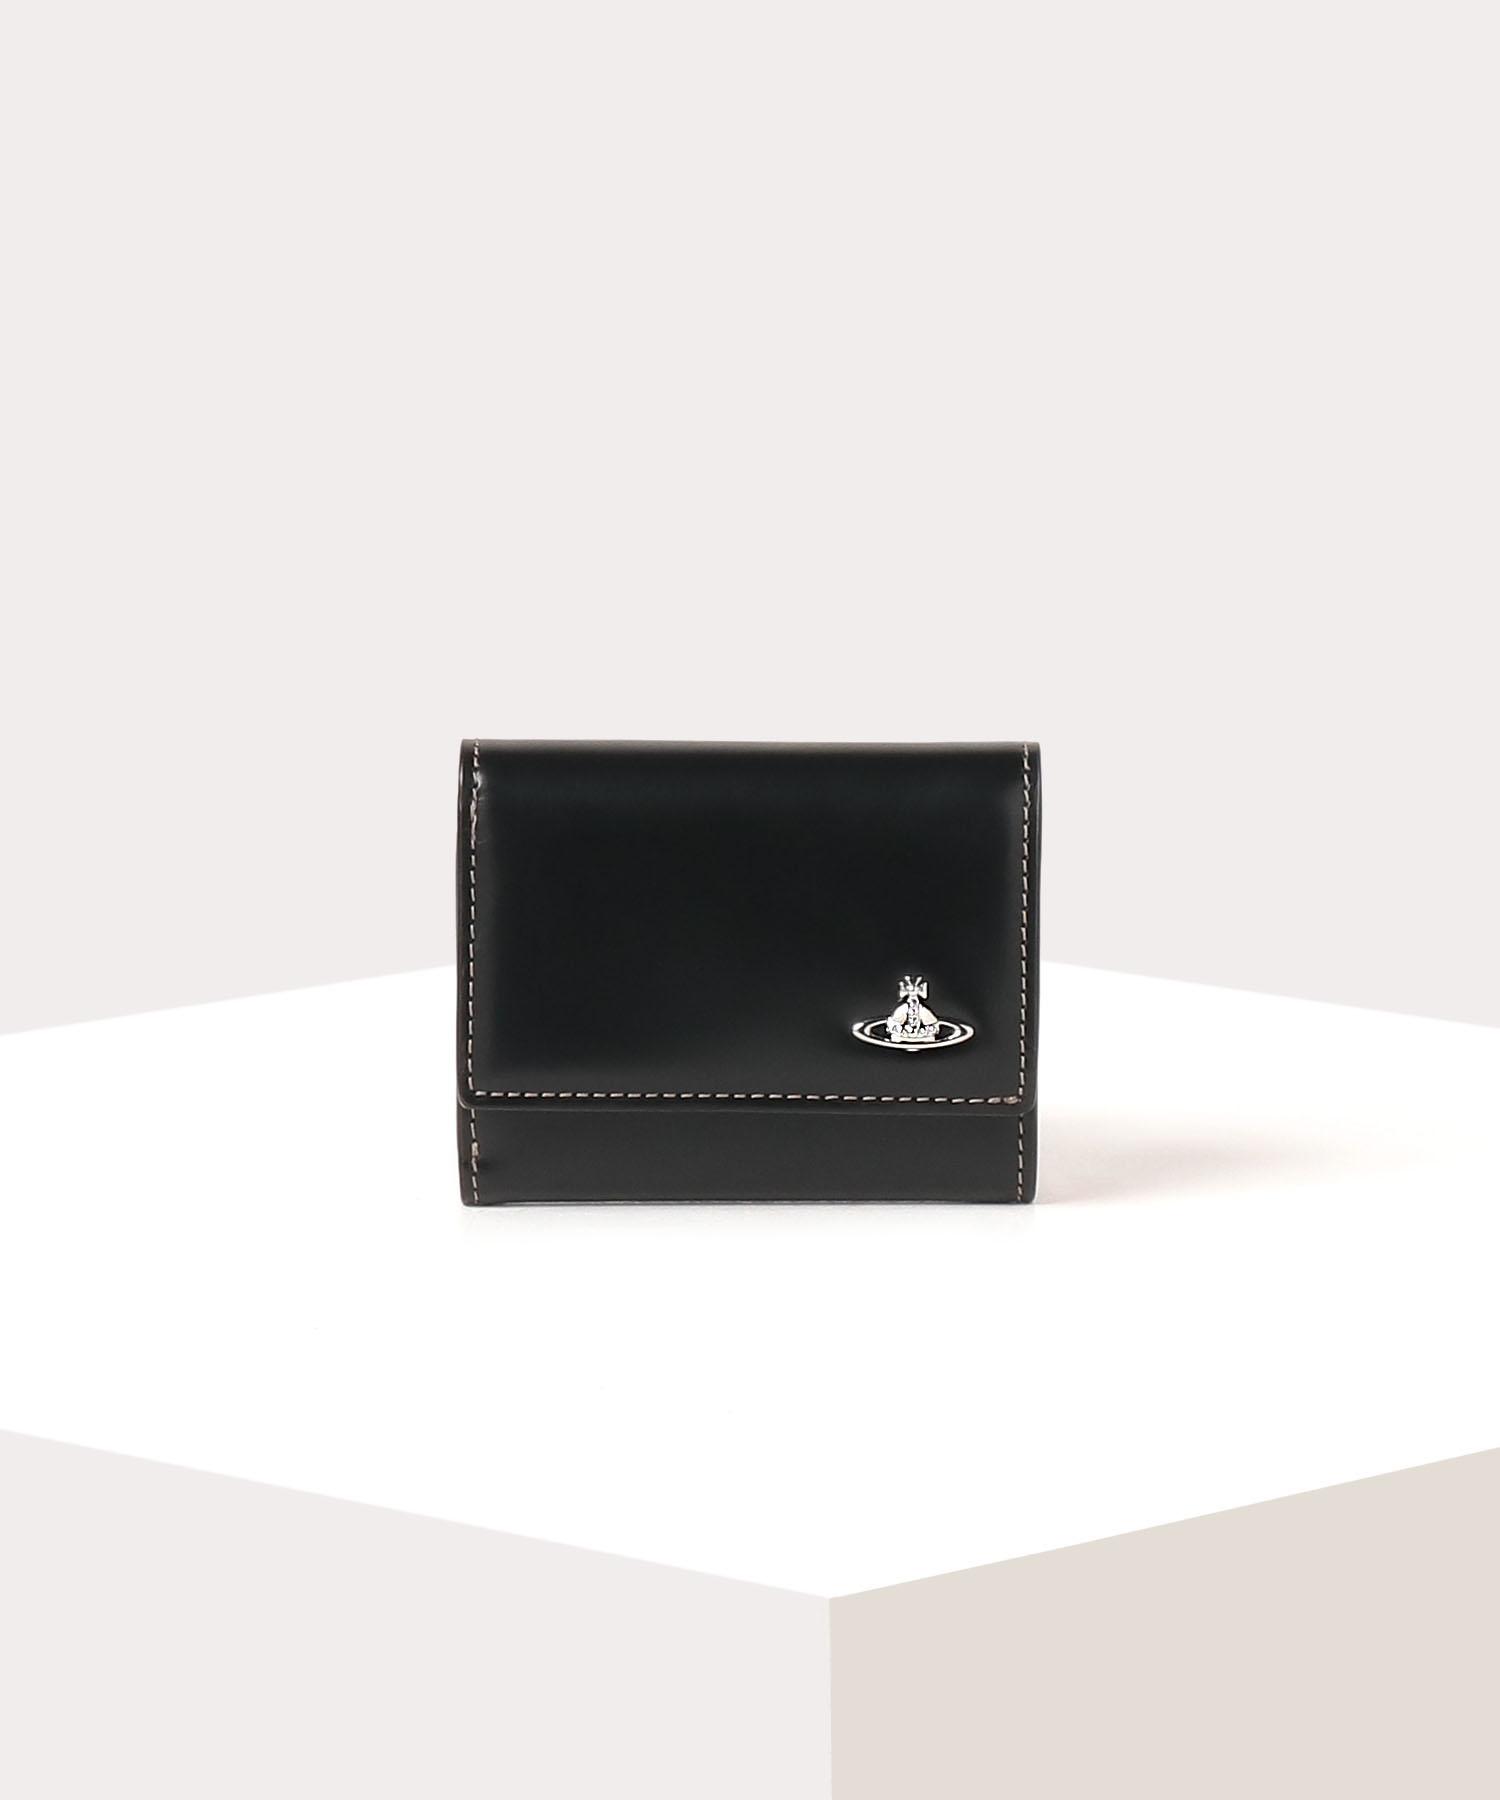 Vivienne Westwood(ヴィヴィアン・ウエストウッド)『トリニティORB 三つ折り財布(109110SW3023)』